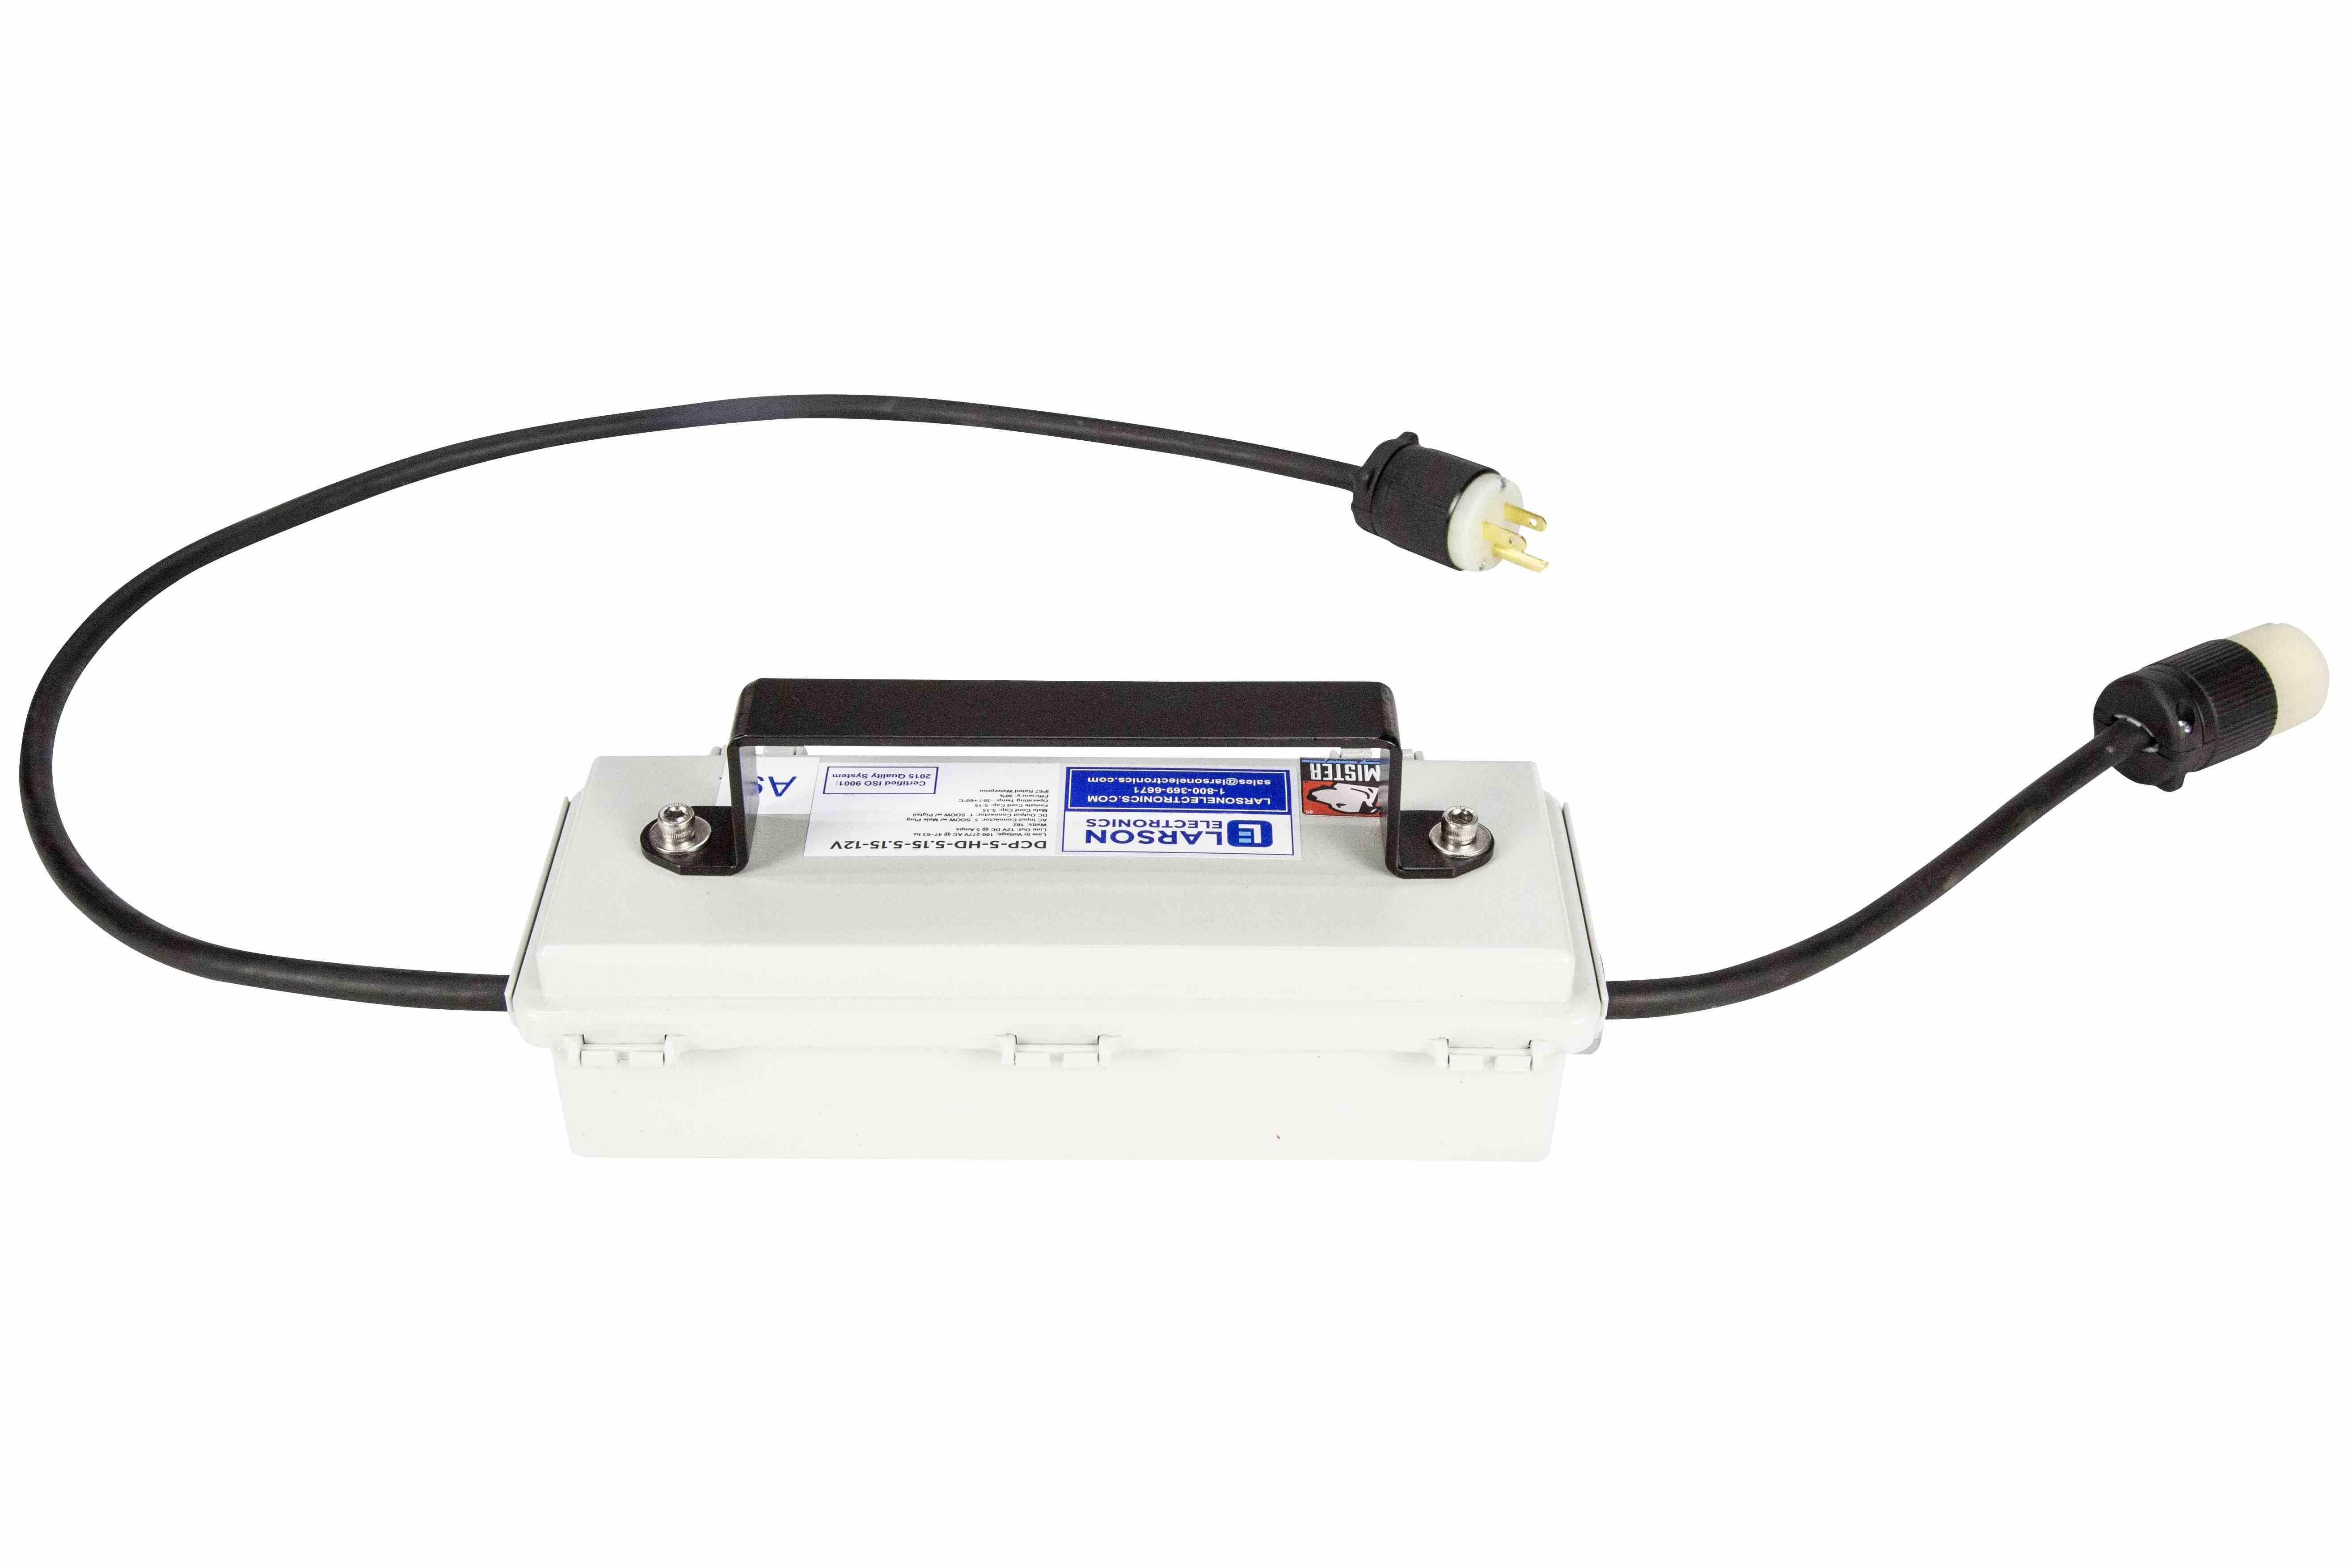 277v to 120v transformer wiring diagram uk house waterproof converts ac 12 24